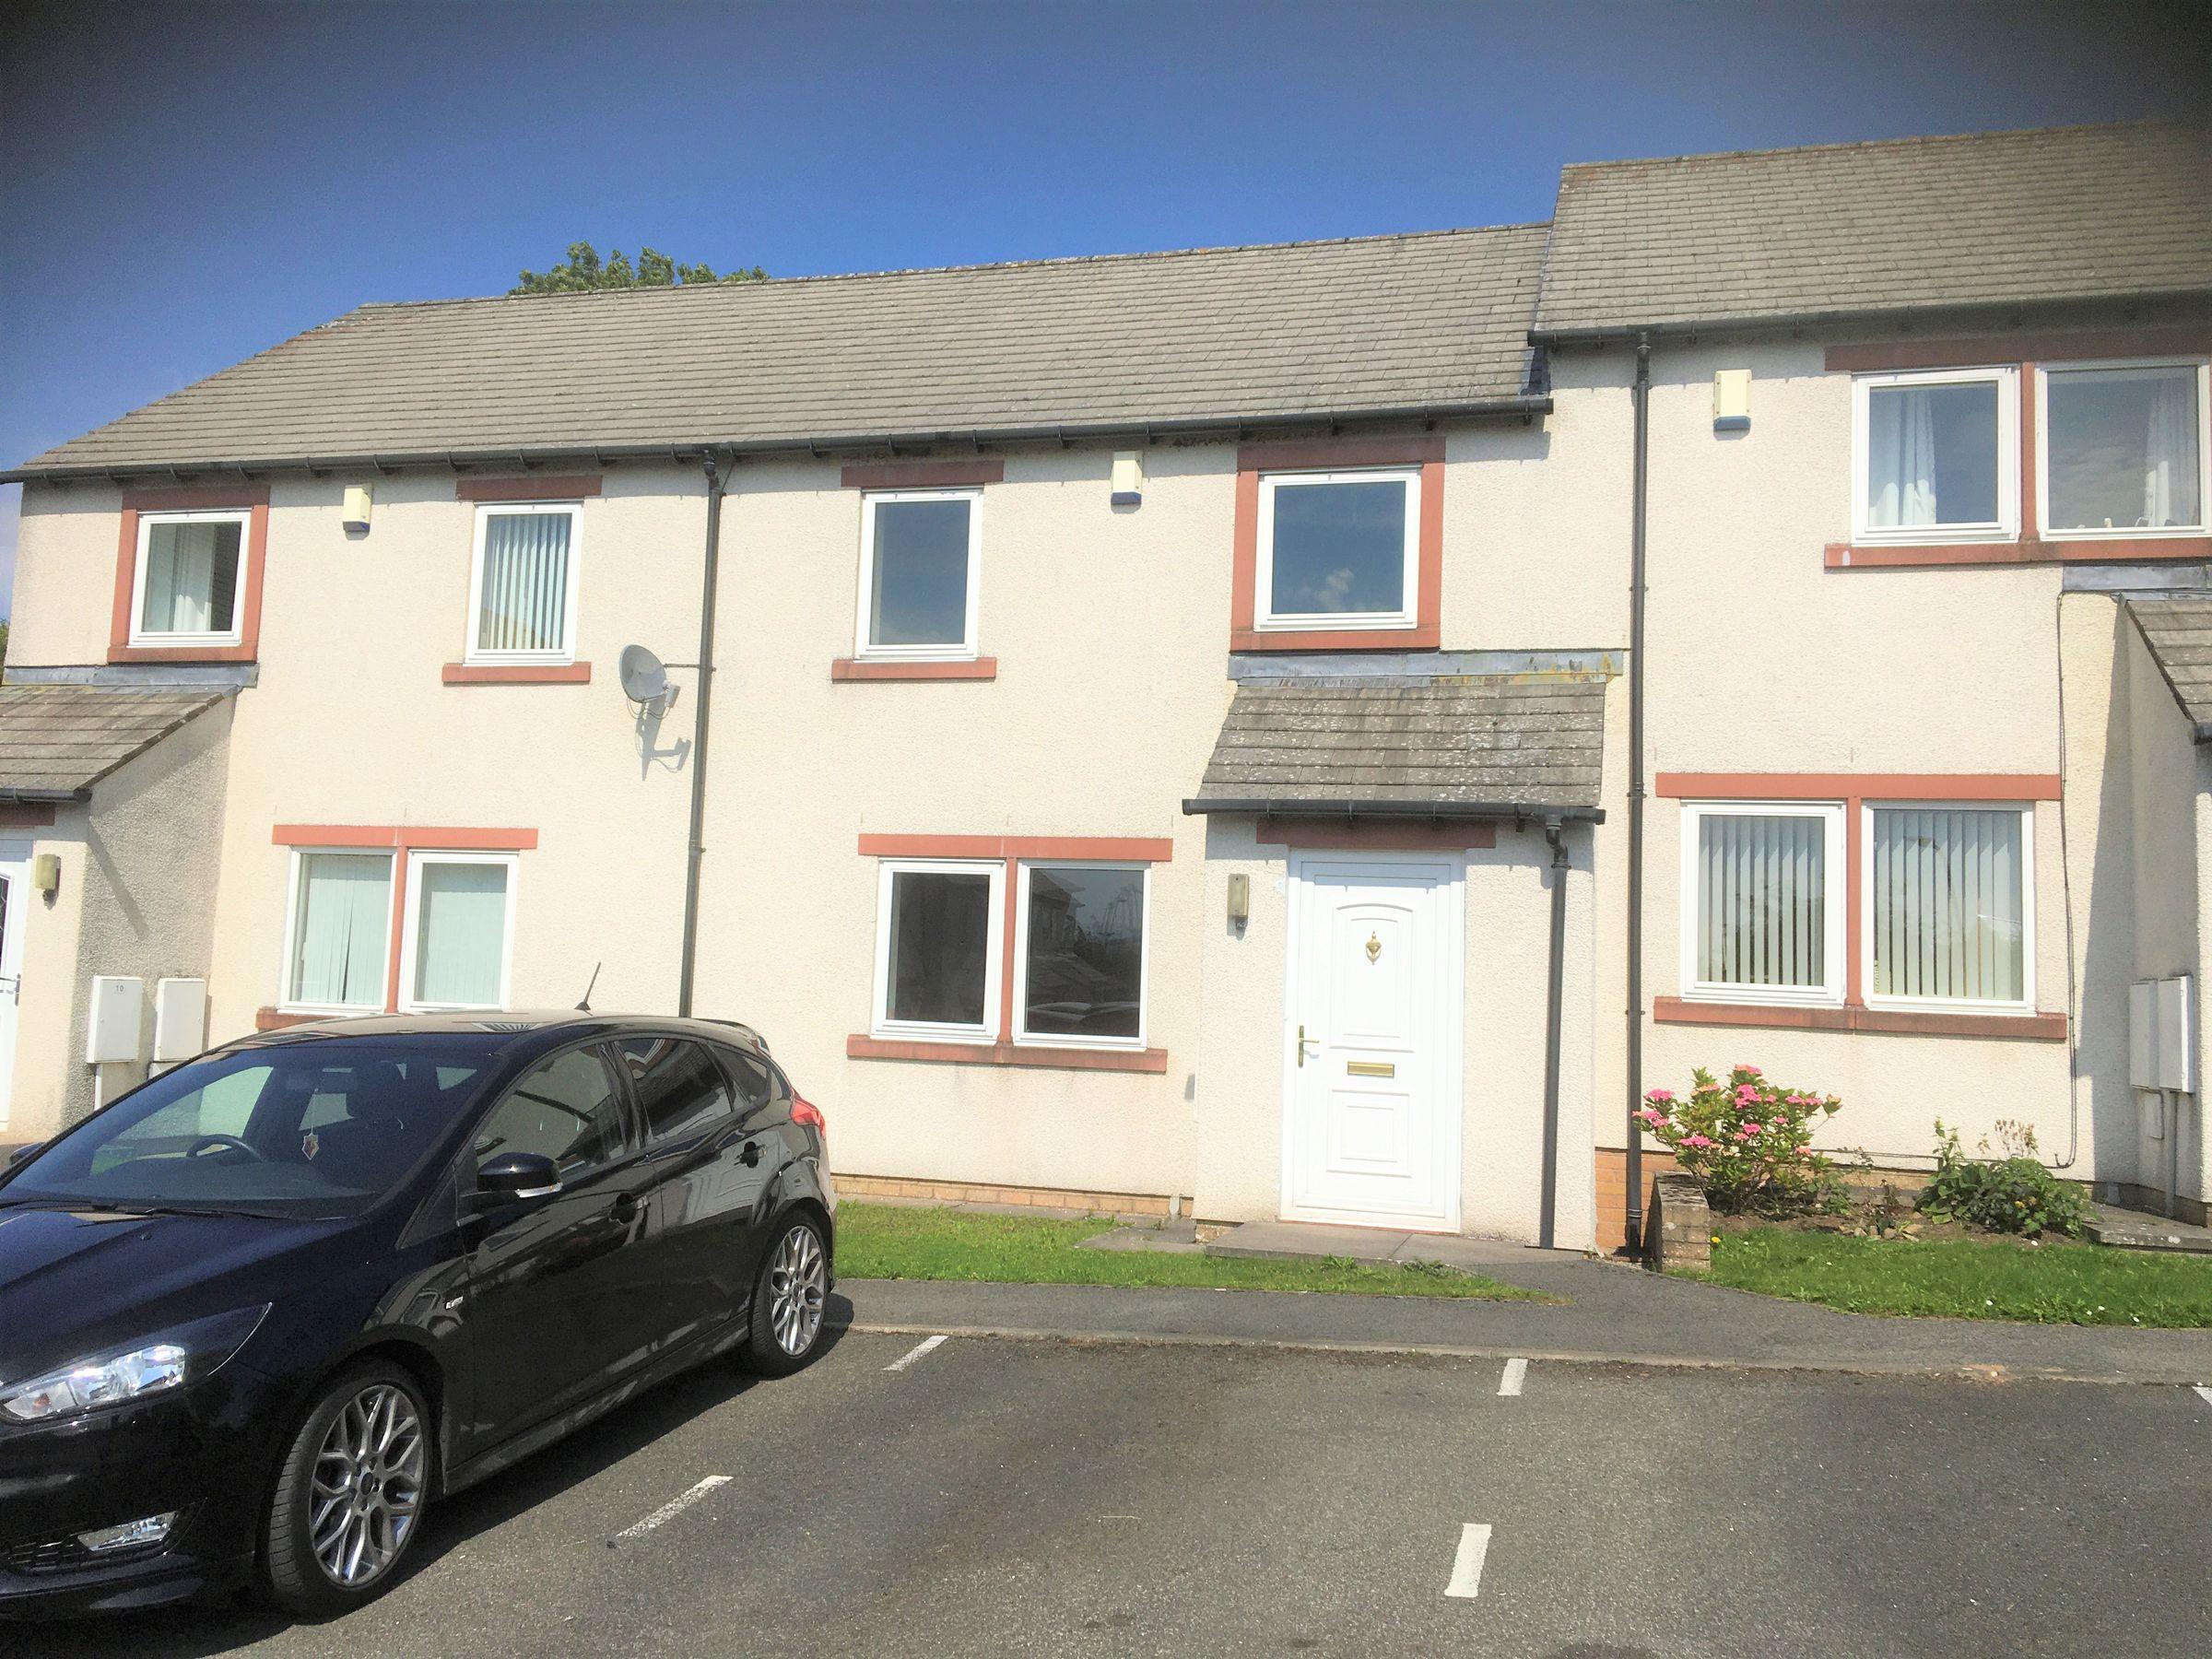 Property photo 1 of 4.